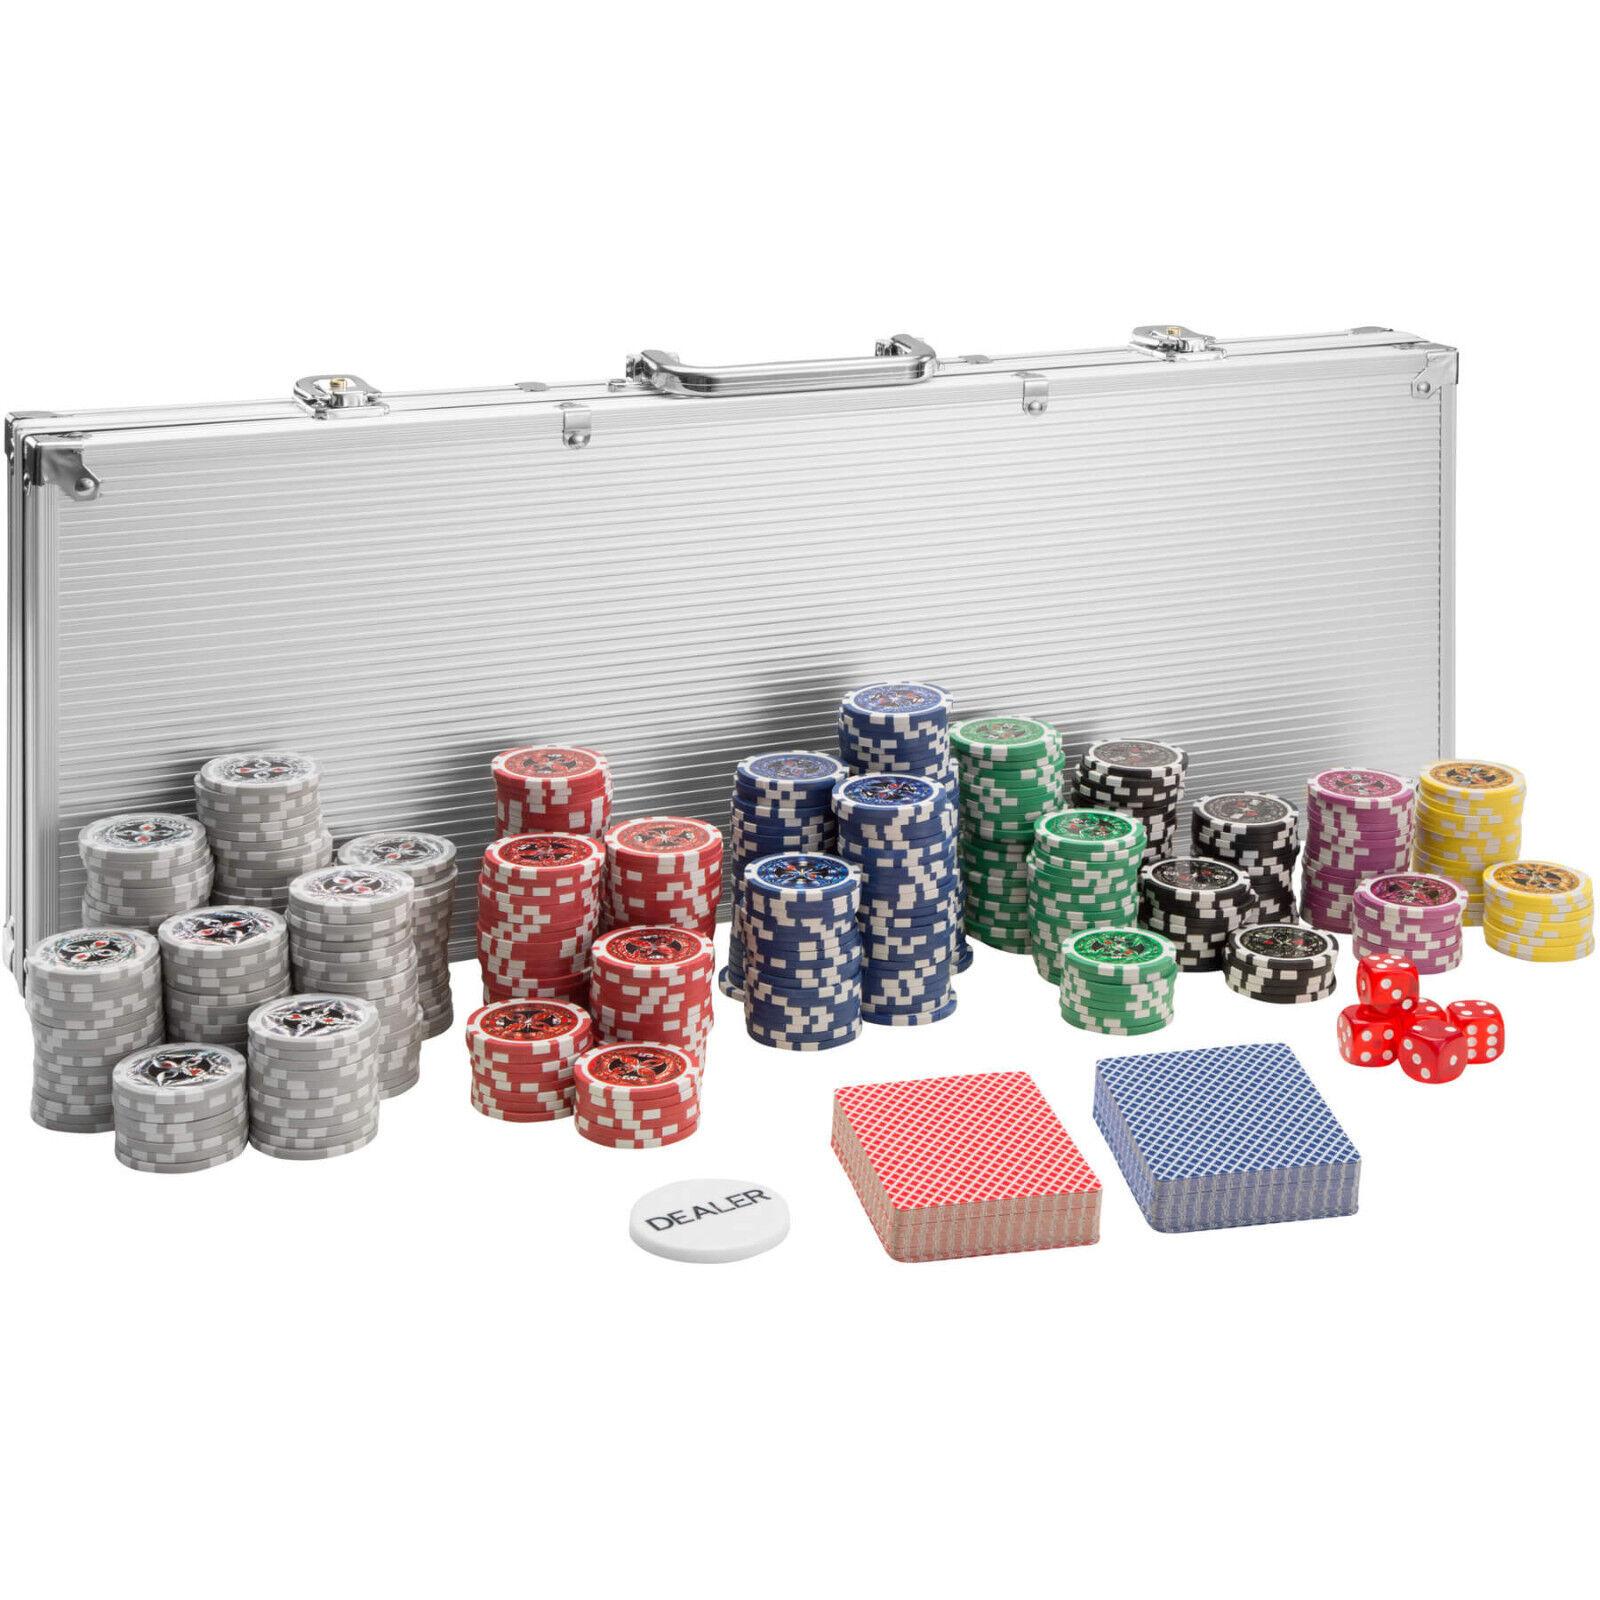 Mallette Poker 500 laser jetons jetons jetons de poker set de poker cards alu valise argent 968bf5